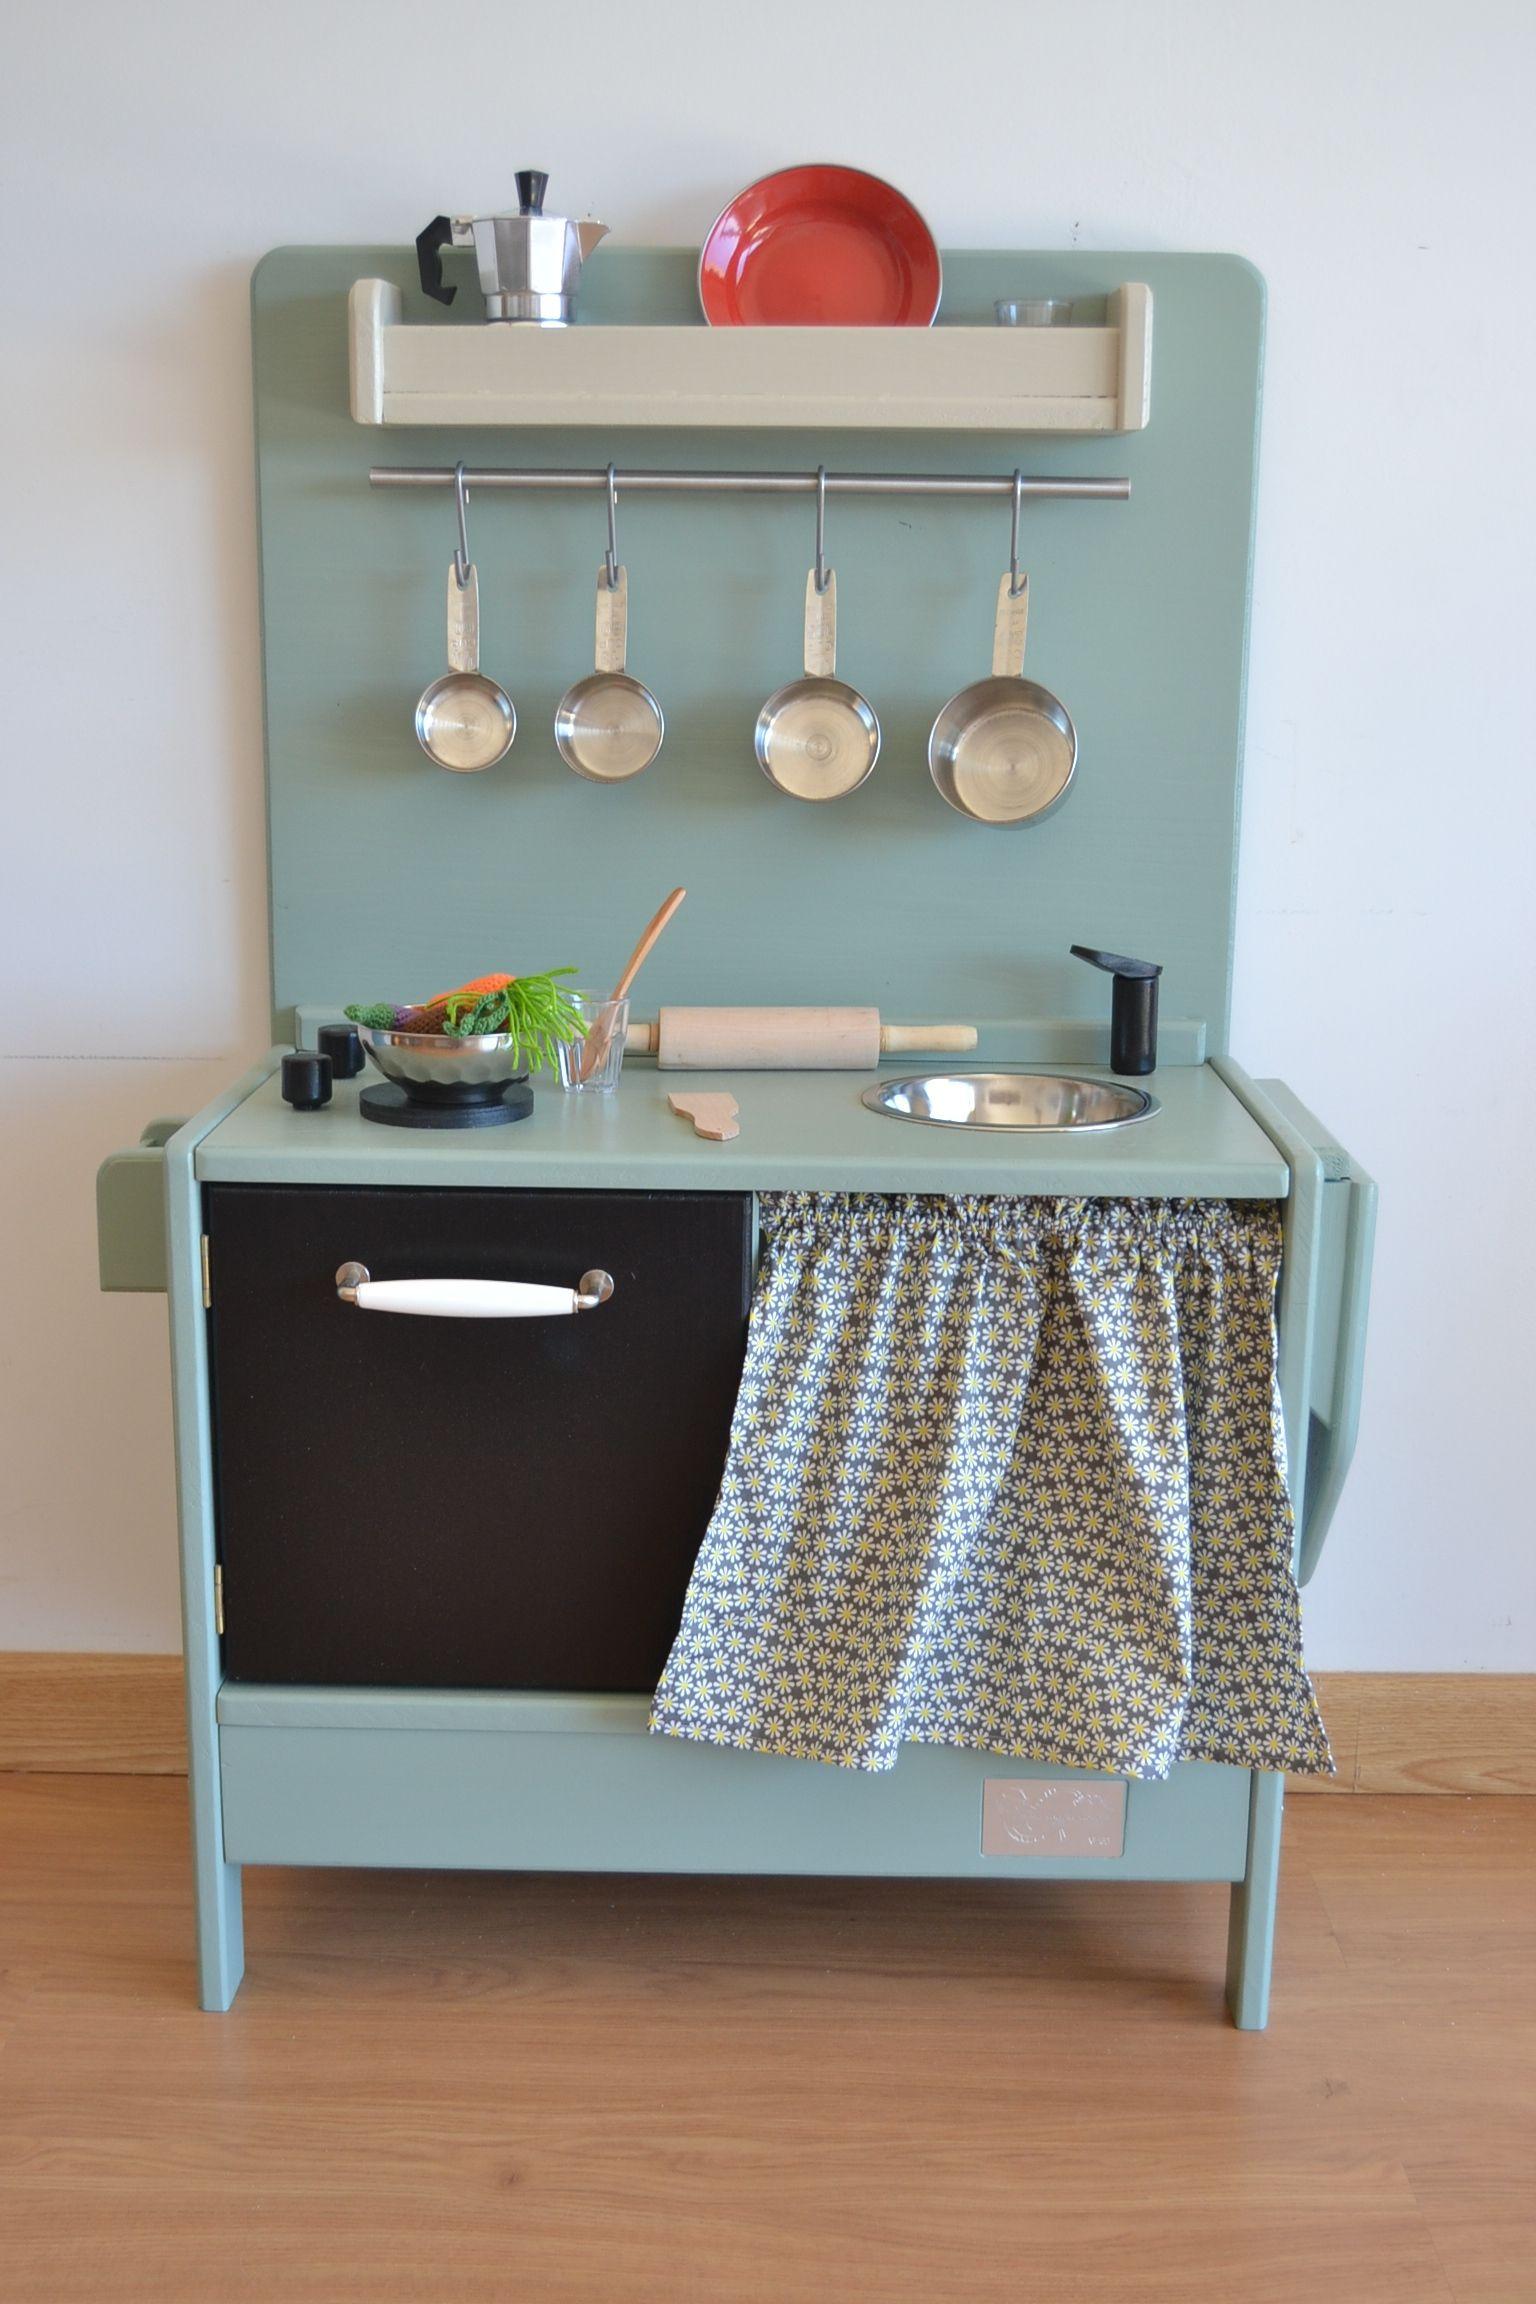 Wooden toy kitchen. BAM model. Macarena Bilbao. | kids | Pinterest ...